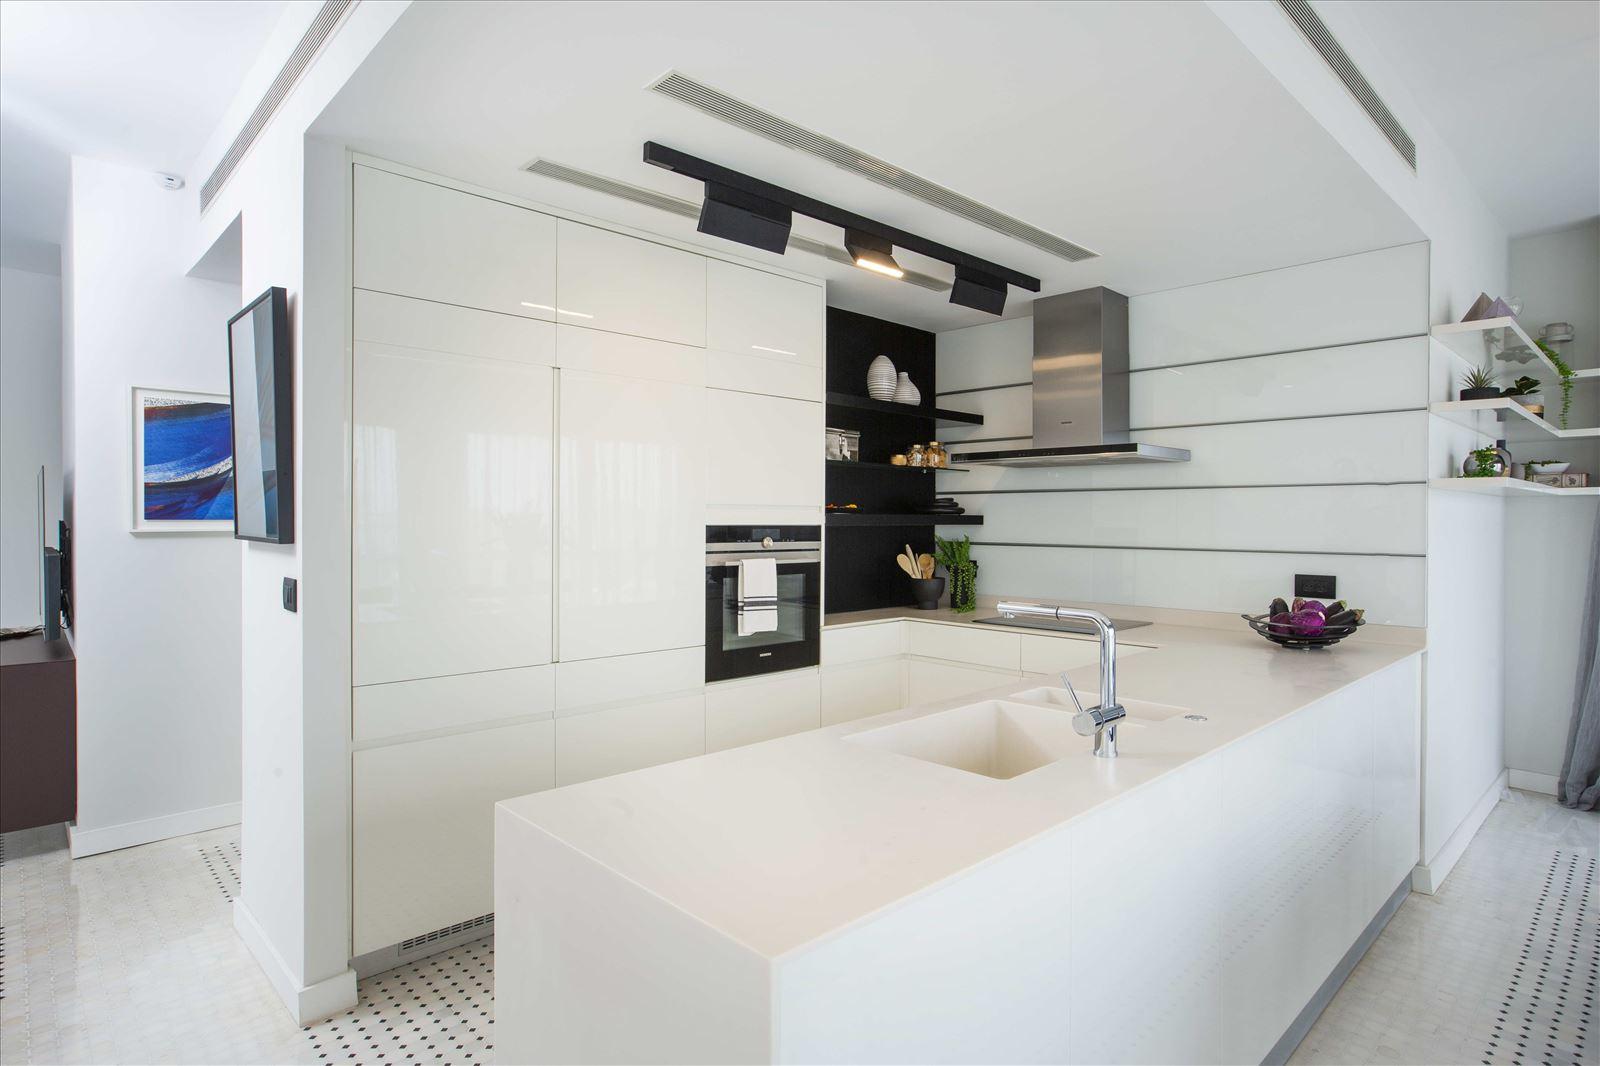 Tel Aviv apartment in Parisian aroma גופי תאורה במטבח על ידי קמחי תאורה